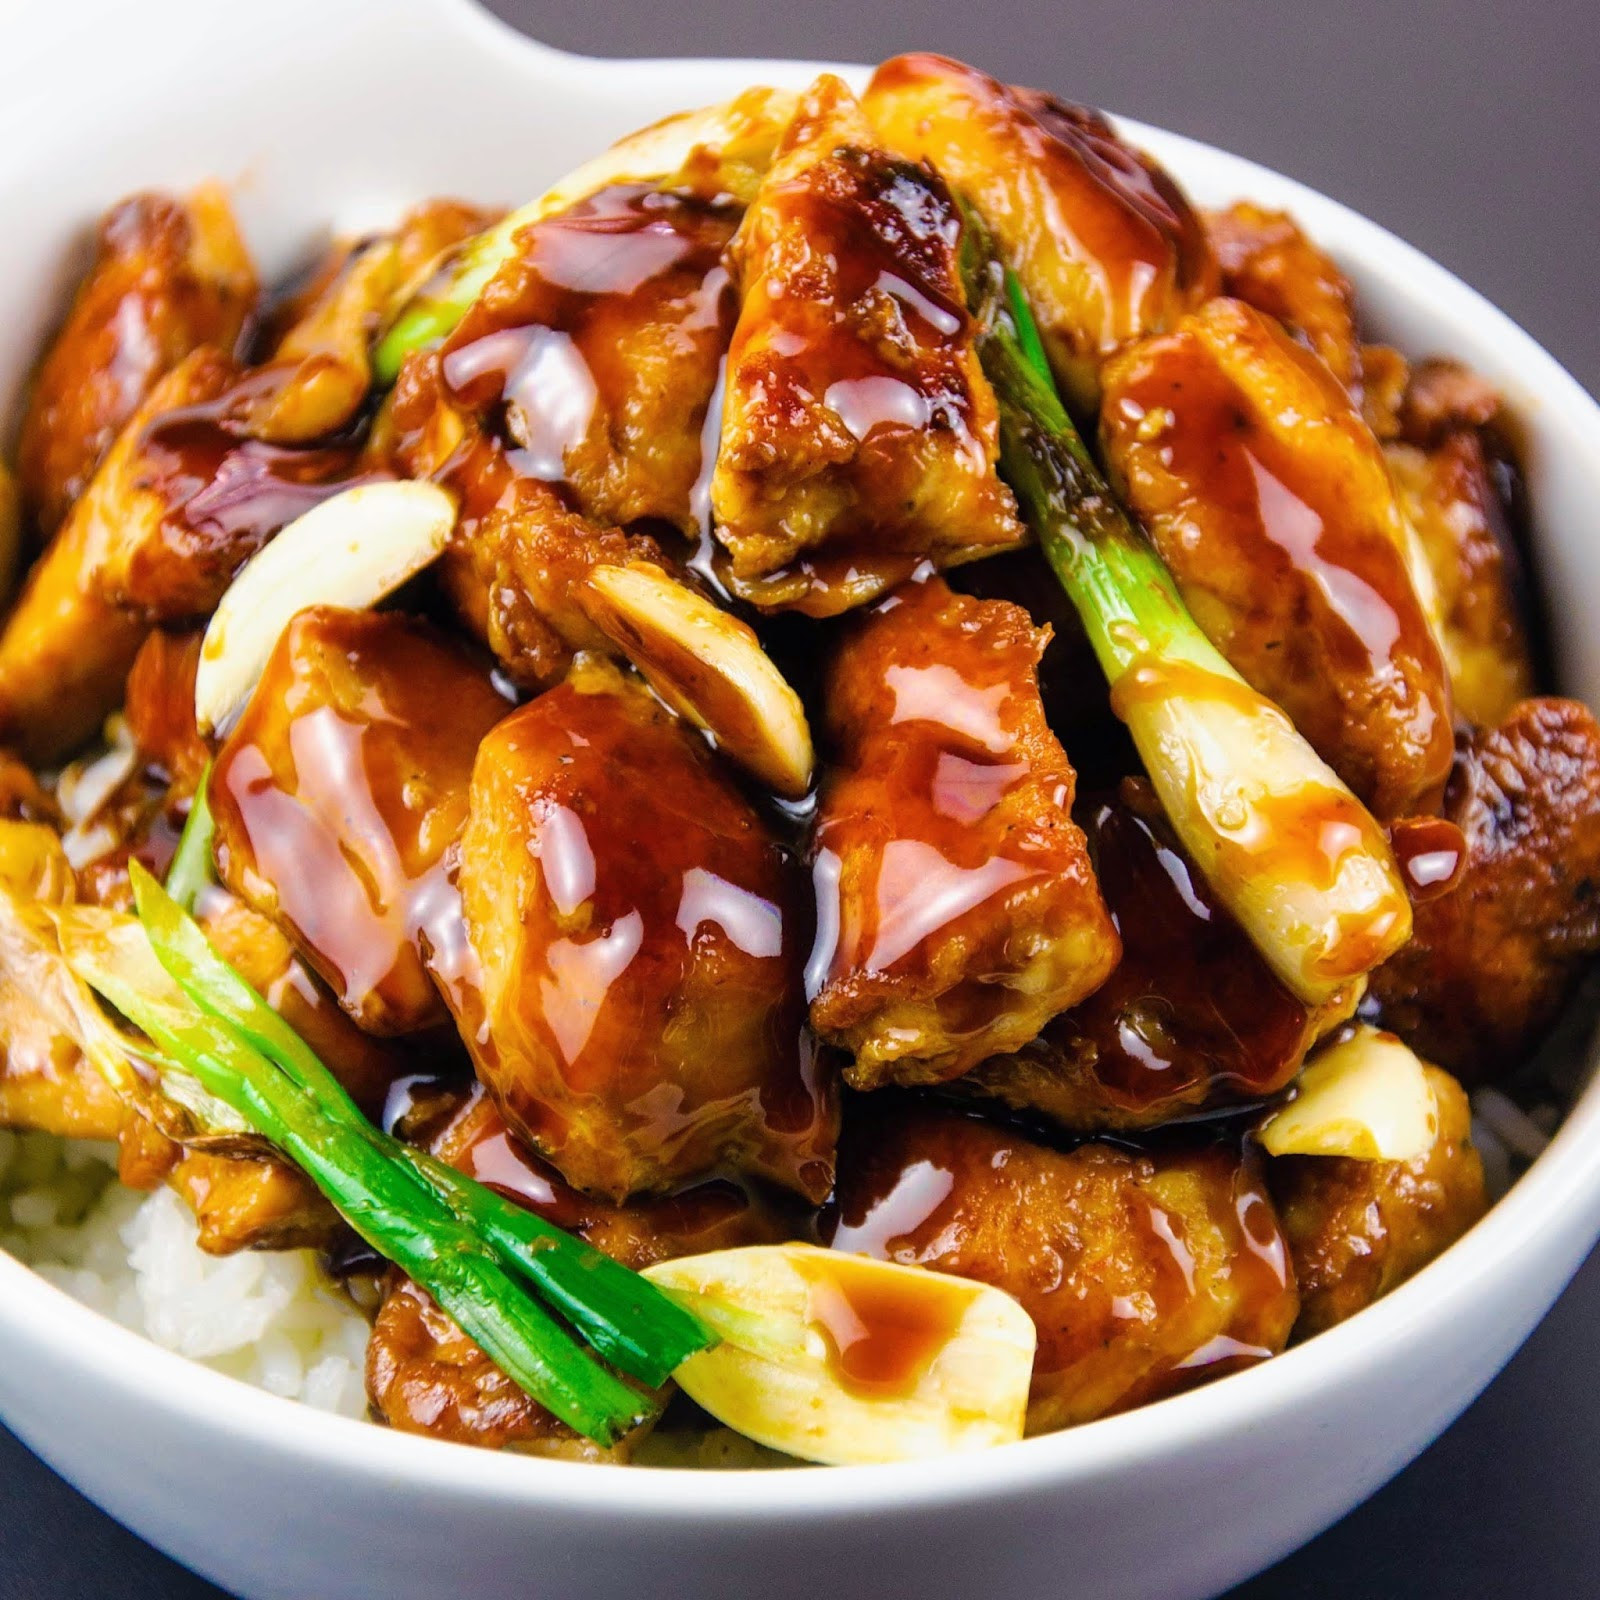 Diabetic Meal Recipes  Diabetic Recipes for Dinner – Diabetic Dinner Recipes